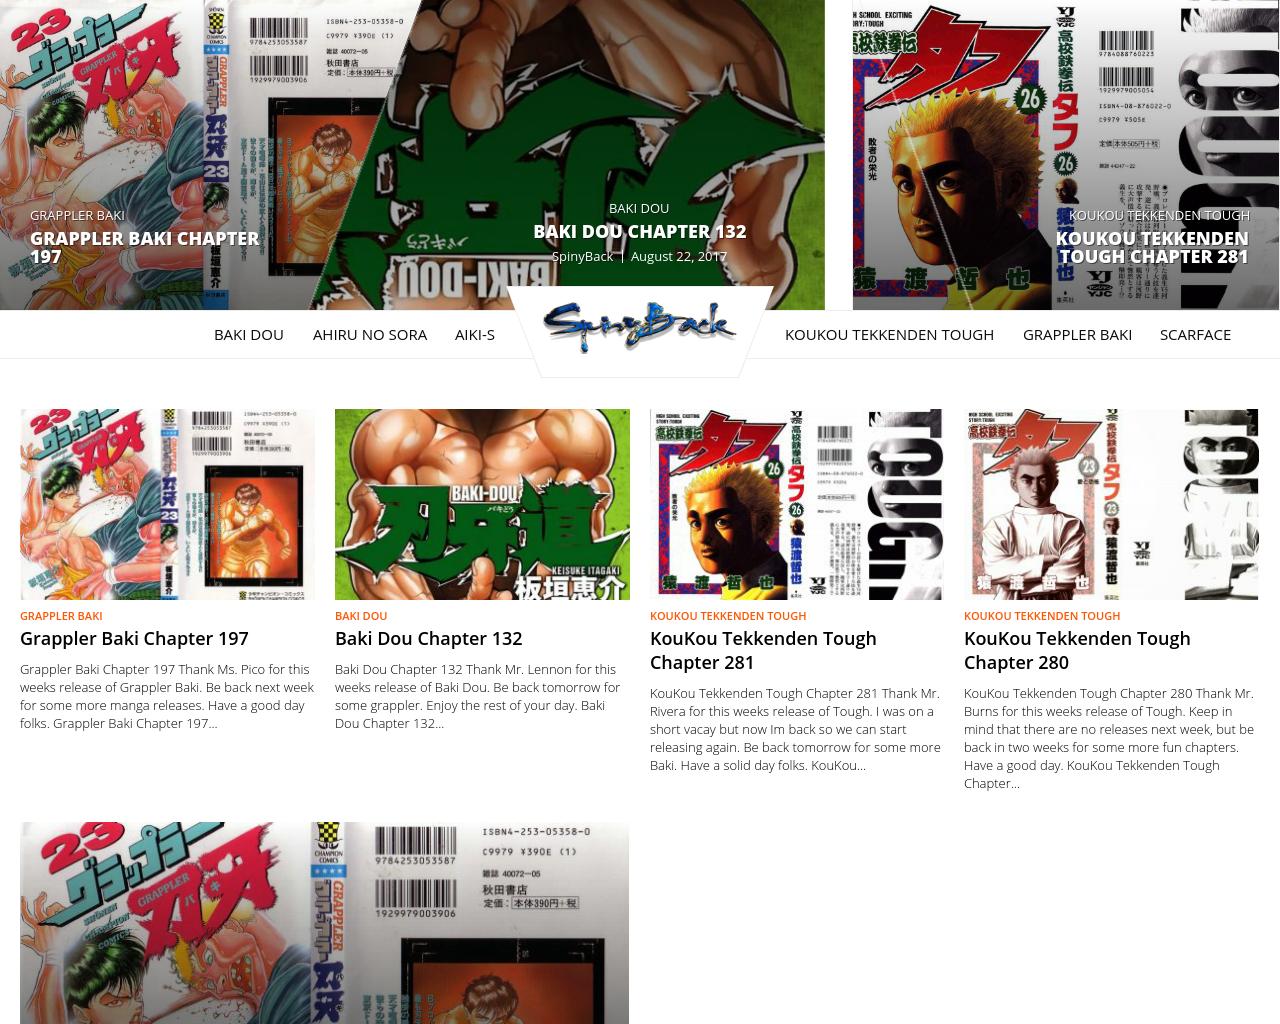 SpinyBackWebDesign-Advertising-Reviews-Pricing